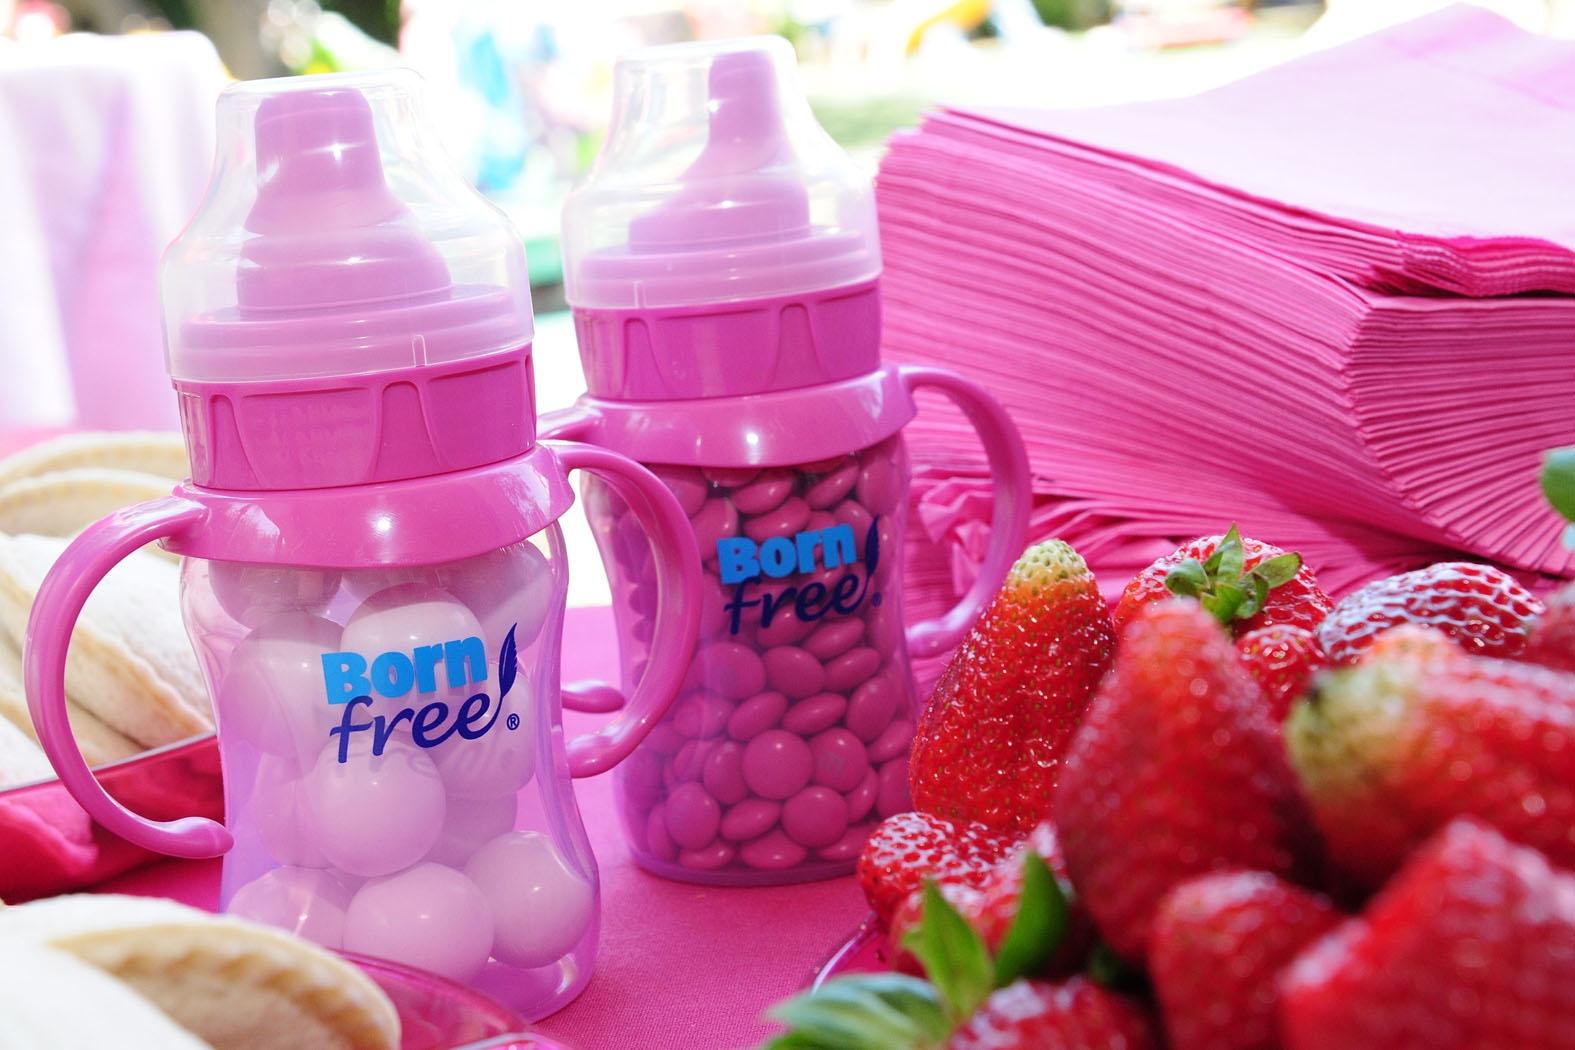 http://3.bp.blogspot.com/_5CqMSP13w1w/TCKV5Fm-oOI/AAAAAAAADp0/PkPey5g9dAc/s1600/Pink+BornFree+Sippy+Cups.jpg